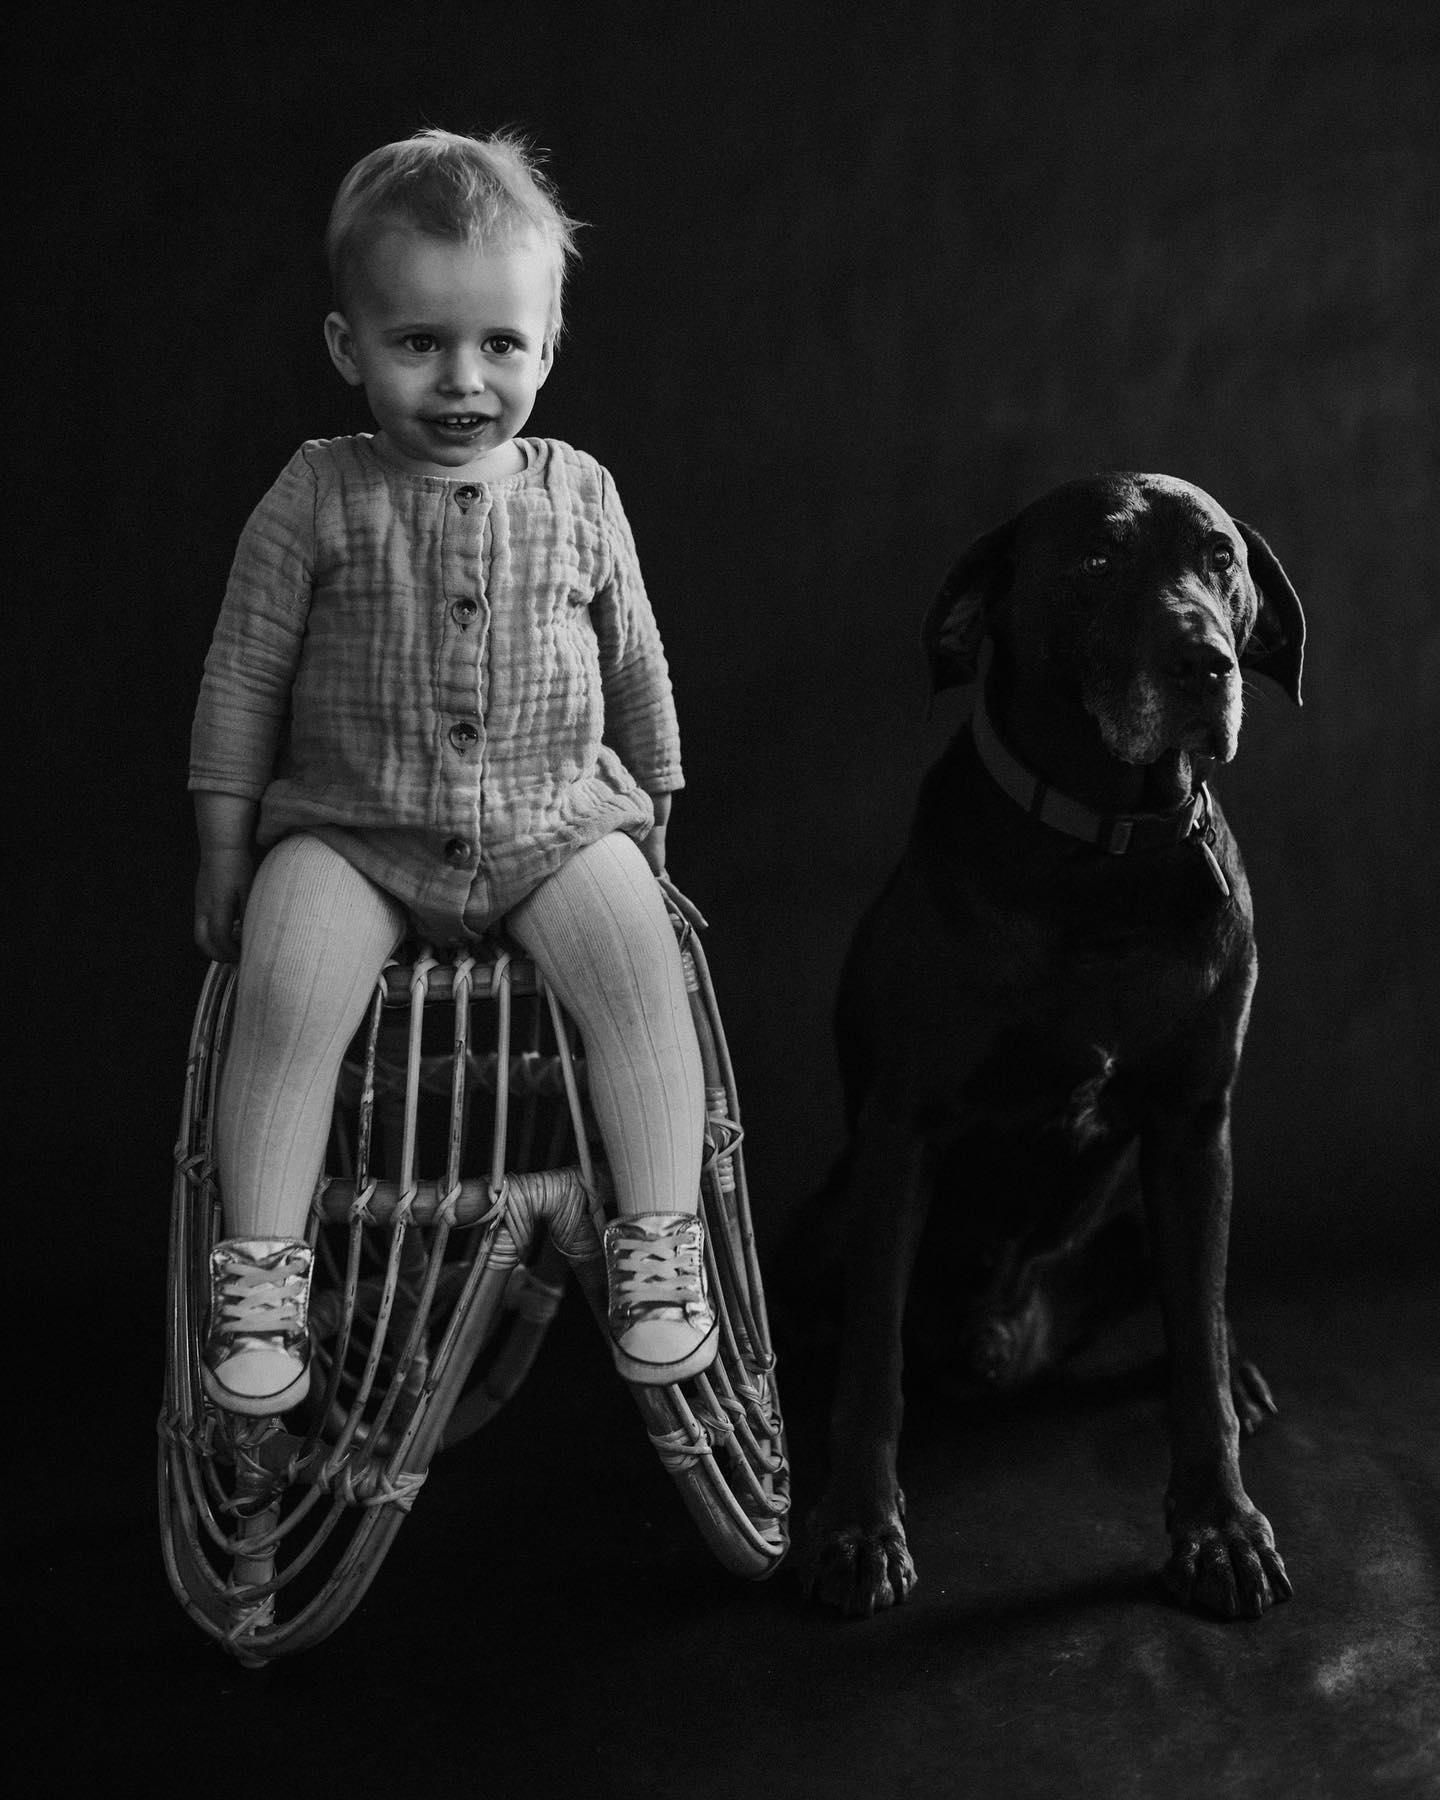 black and white studio portrait of Child and pet dog